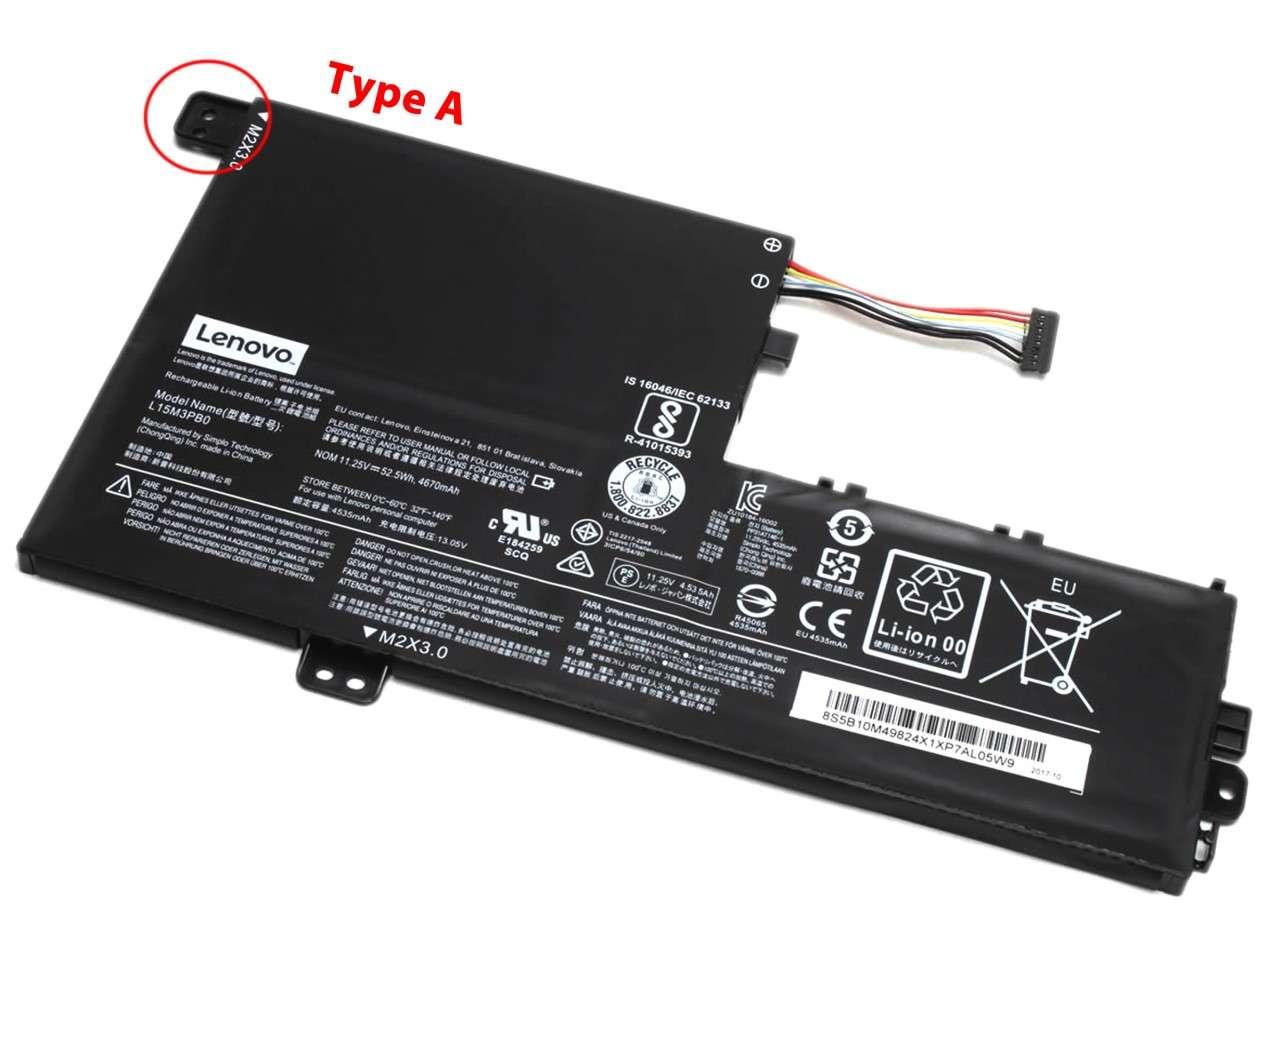 Baterie Lenovo IdeaPad 520S 14IKB Originala 52.5Wh Type A imagine powerlaptop.ro 2021